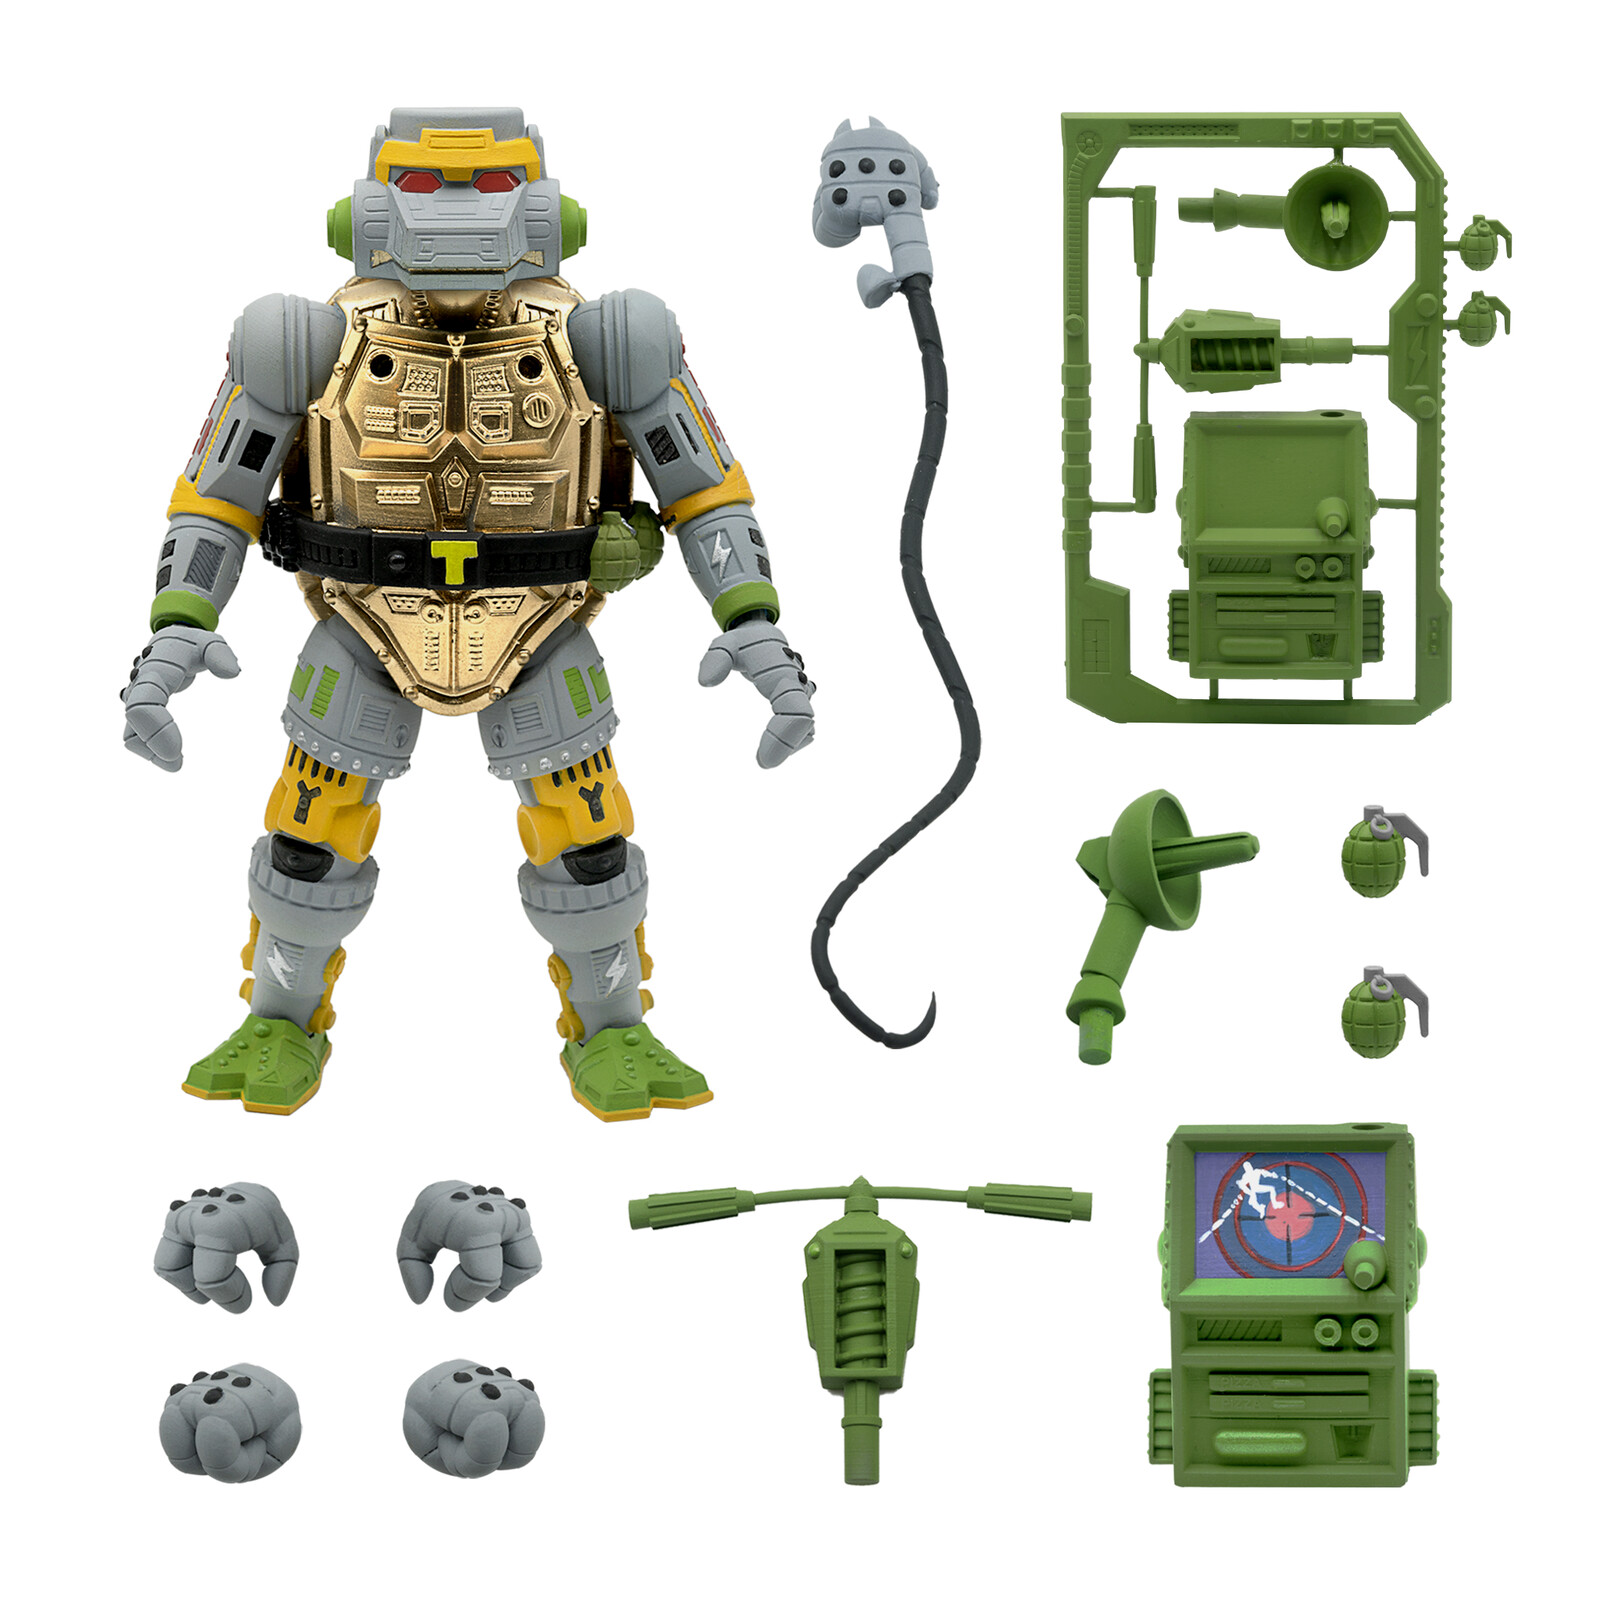 SUPER 7 Wave 3 TMNT Metalhead and accessories.